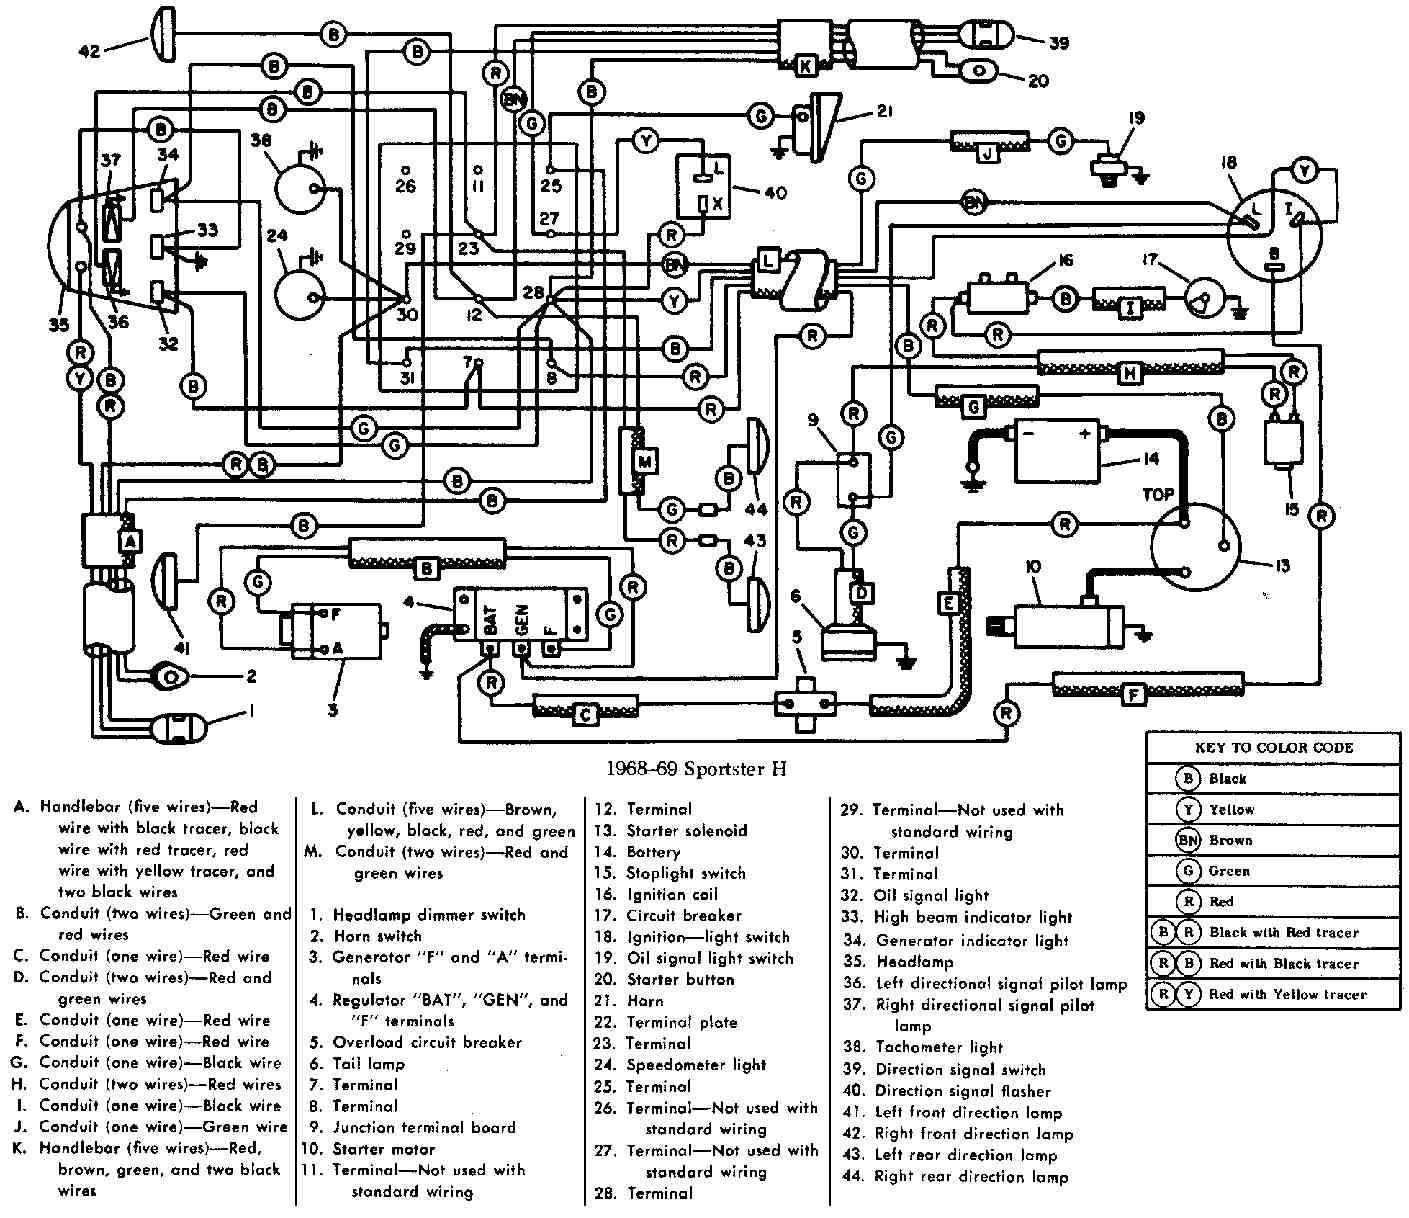 2003 harley softail wiring diagram harley